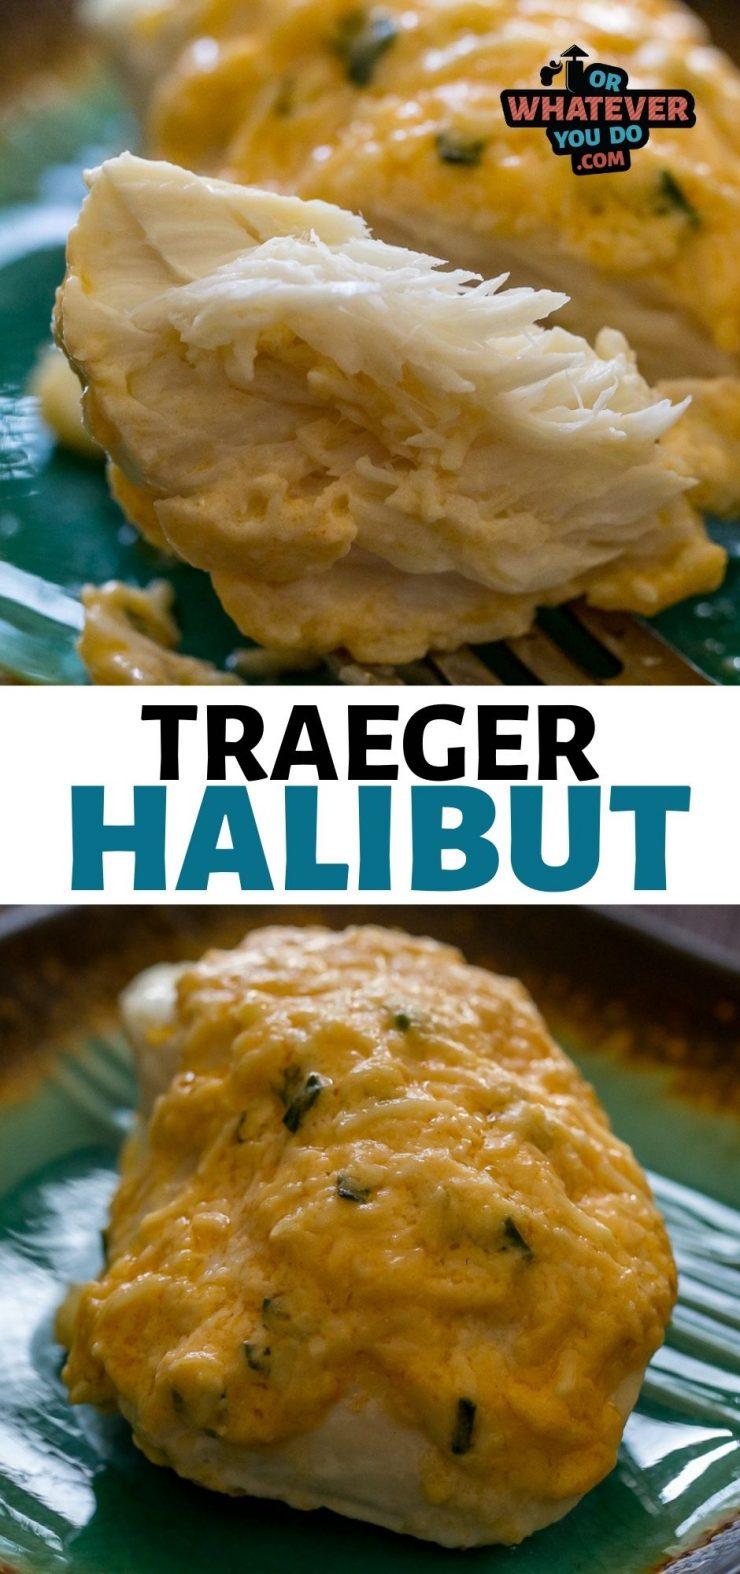 Traeger Halibut with Parmesan Crust